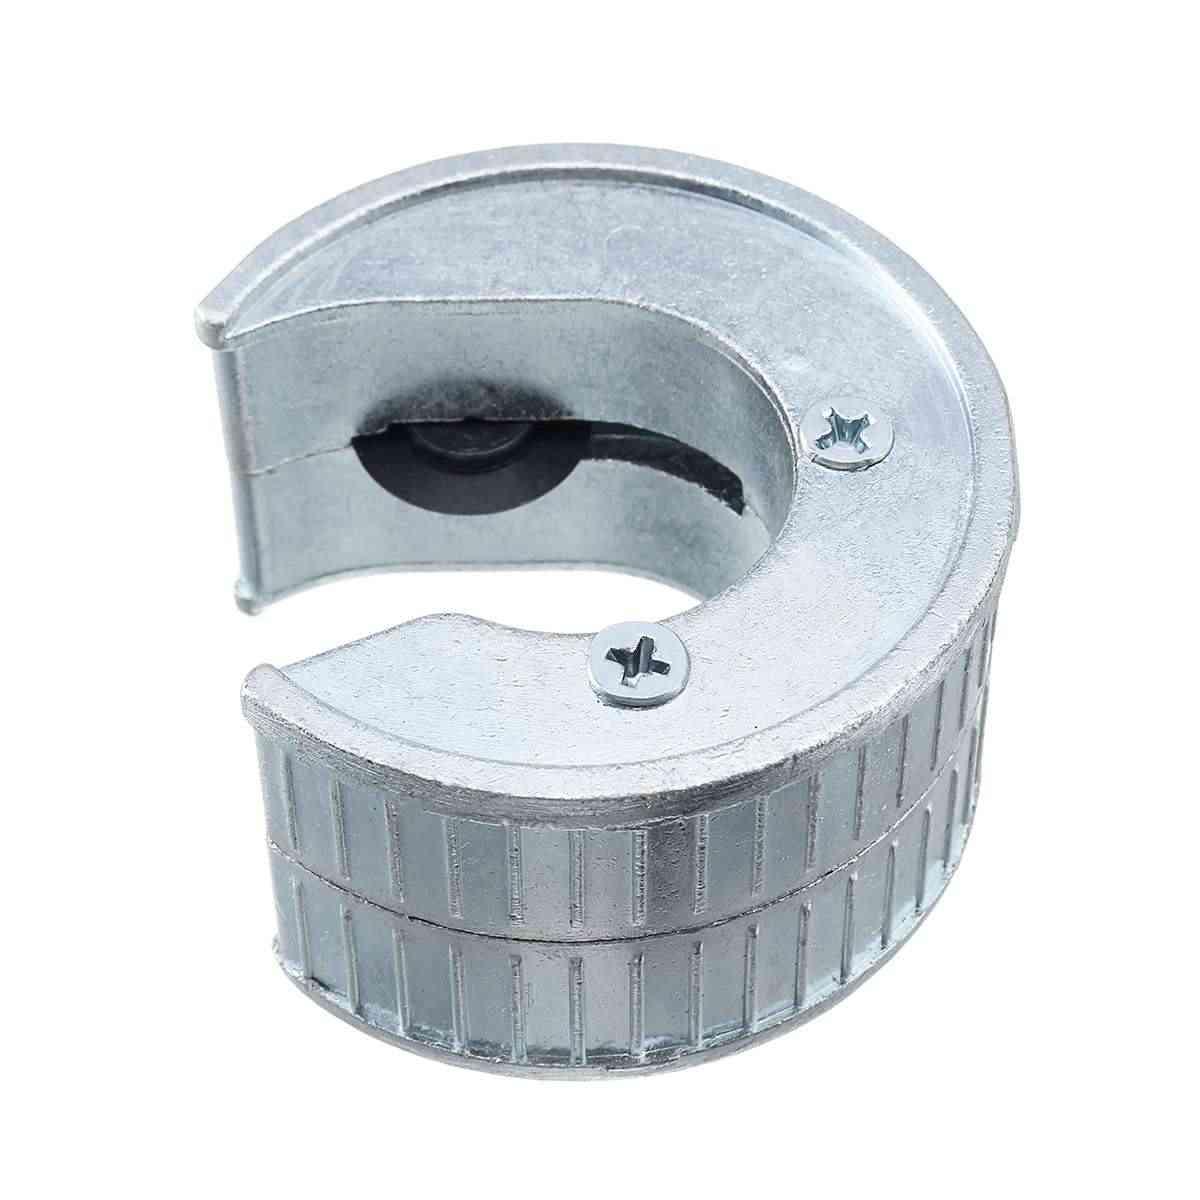 1pcs 15MM / 22MM / 28MM Heavy Duty Self-adjusting Zinc Pipe Tube Cutter Self Locking Copper Plastic Tube Factory Hand Scissors